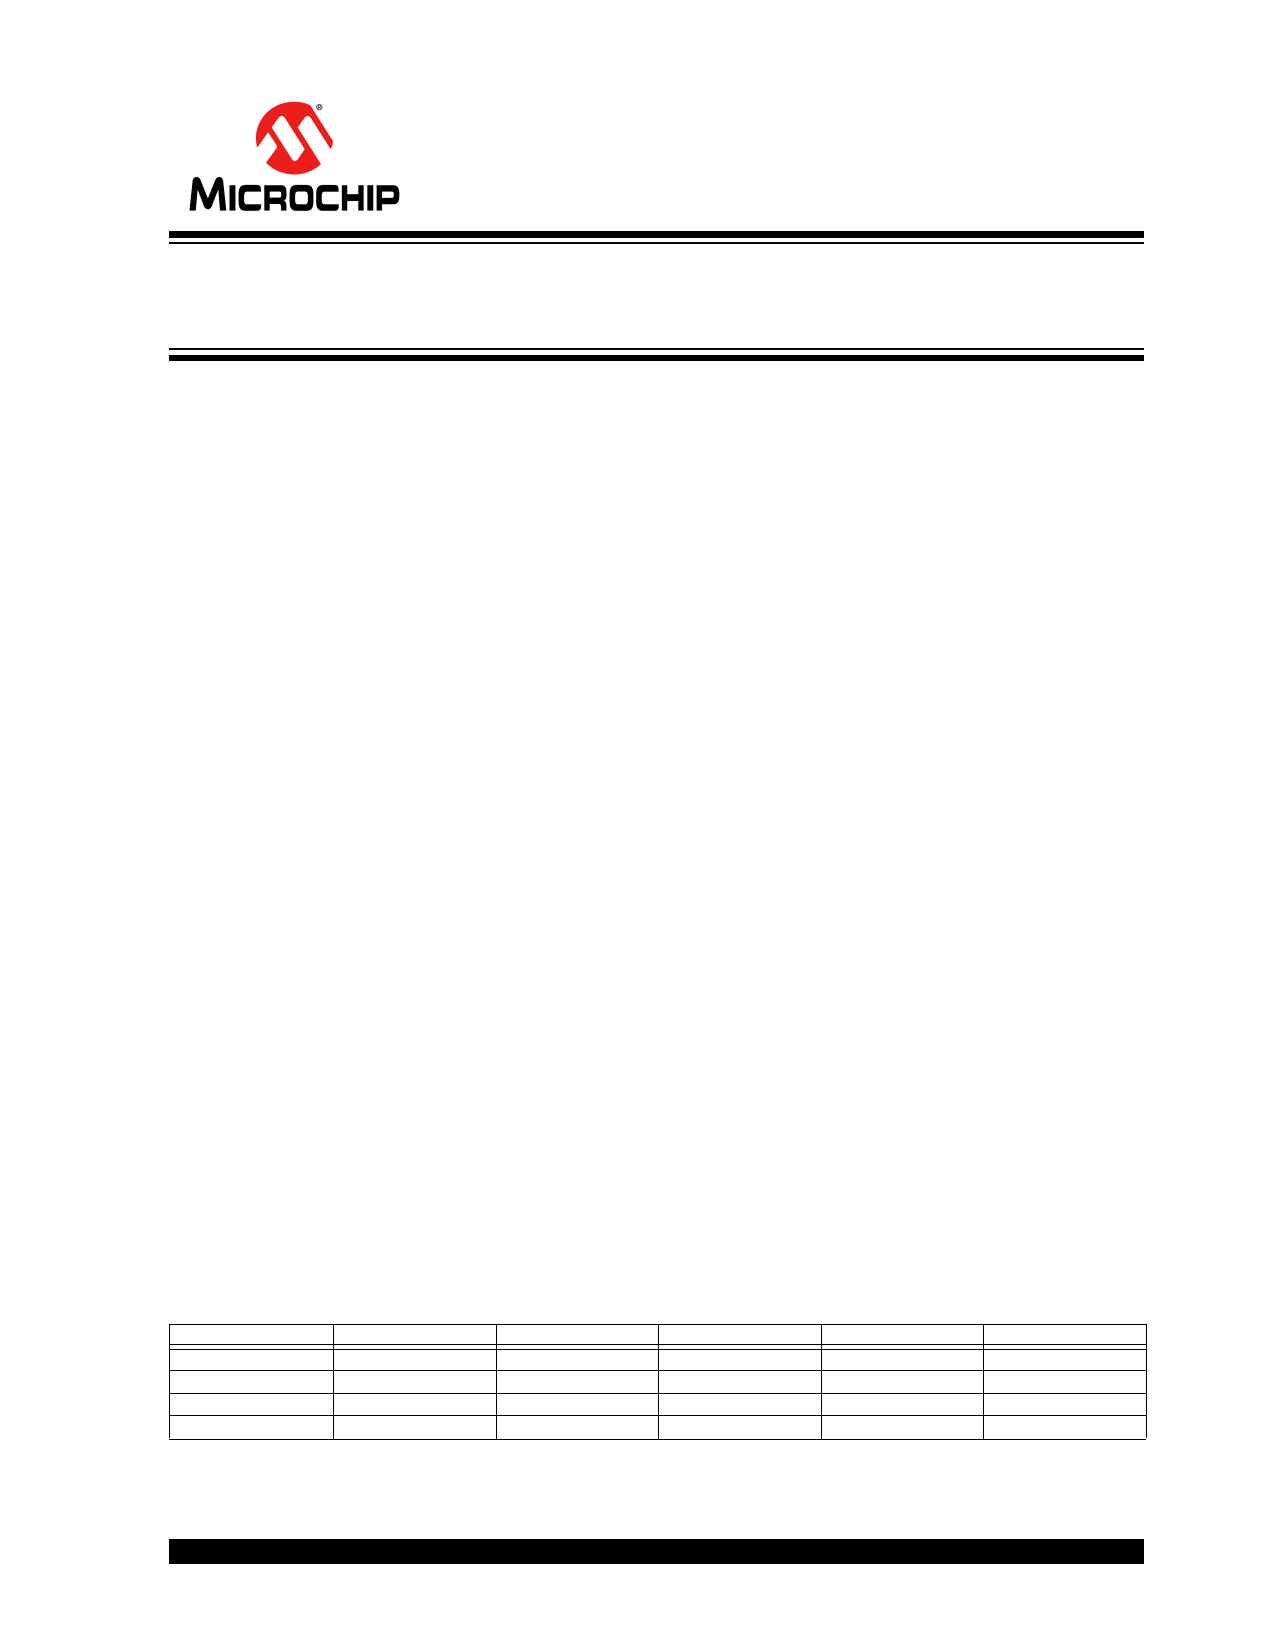 PIC24HJ64GP202 데이터시트 및 PIC24HJ64GP202 PDF